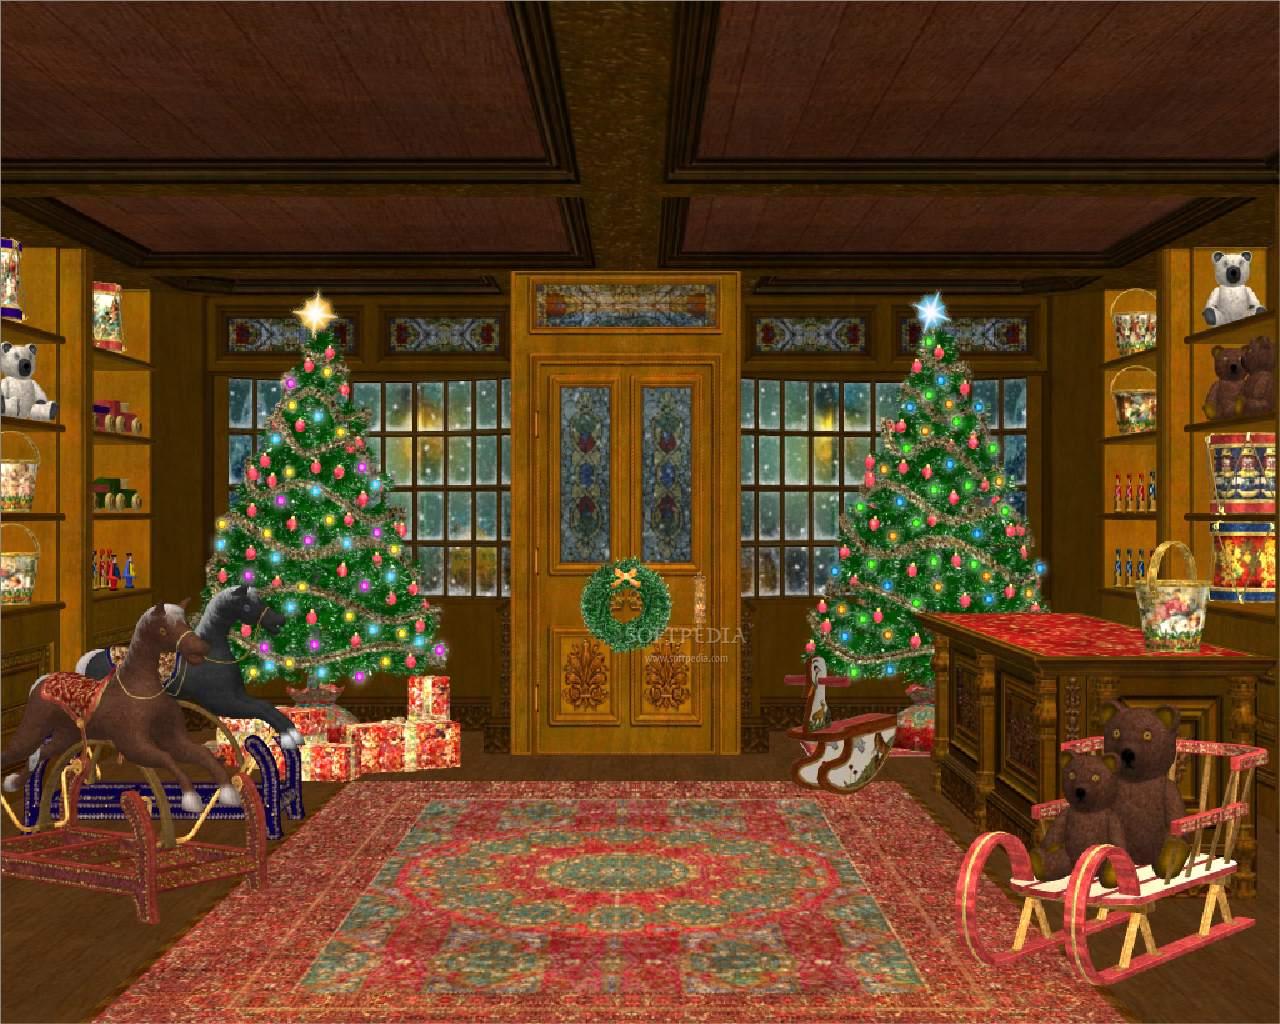 animated christmas desktop background - Free Desktop Wallpaper